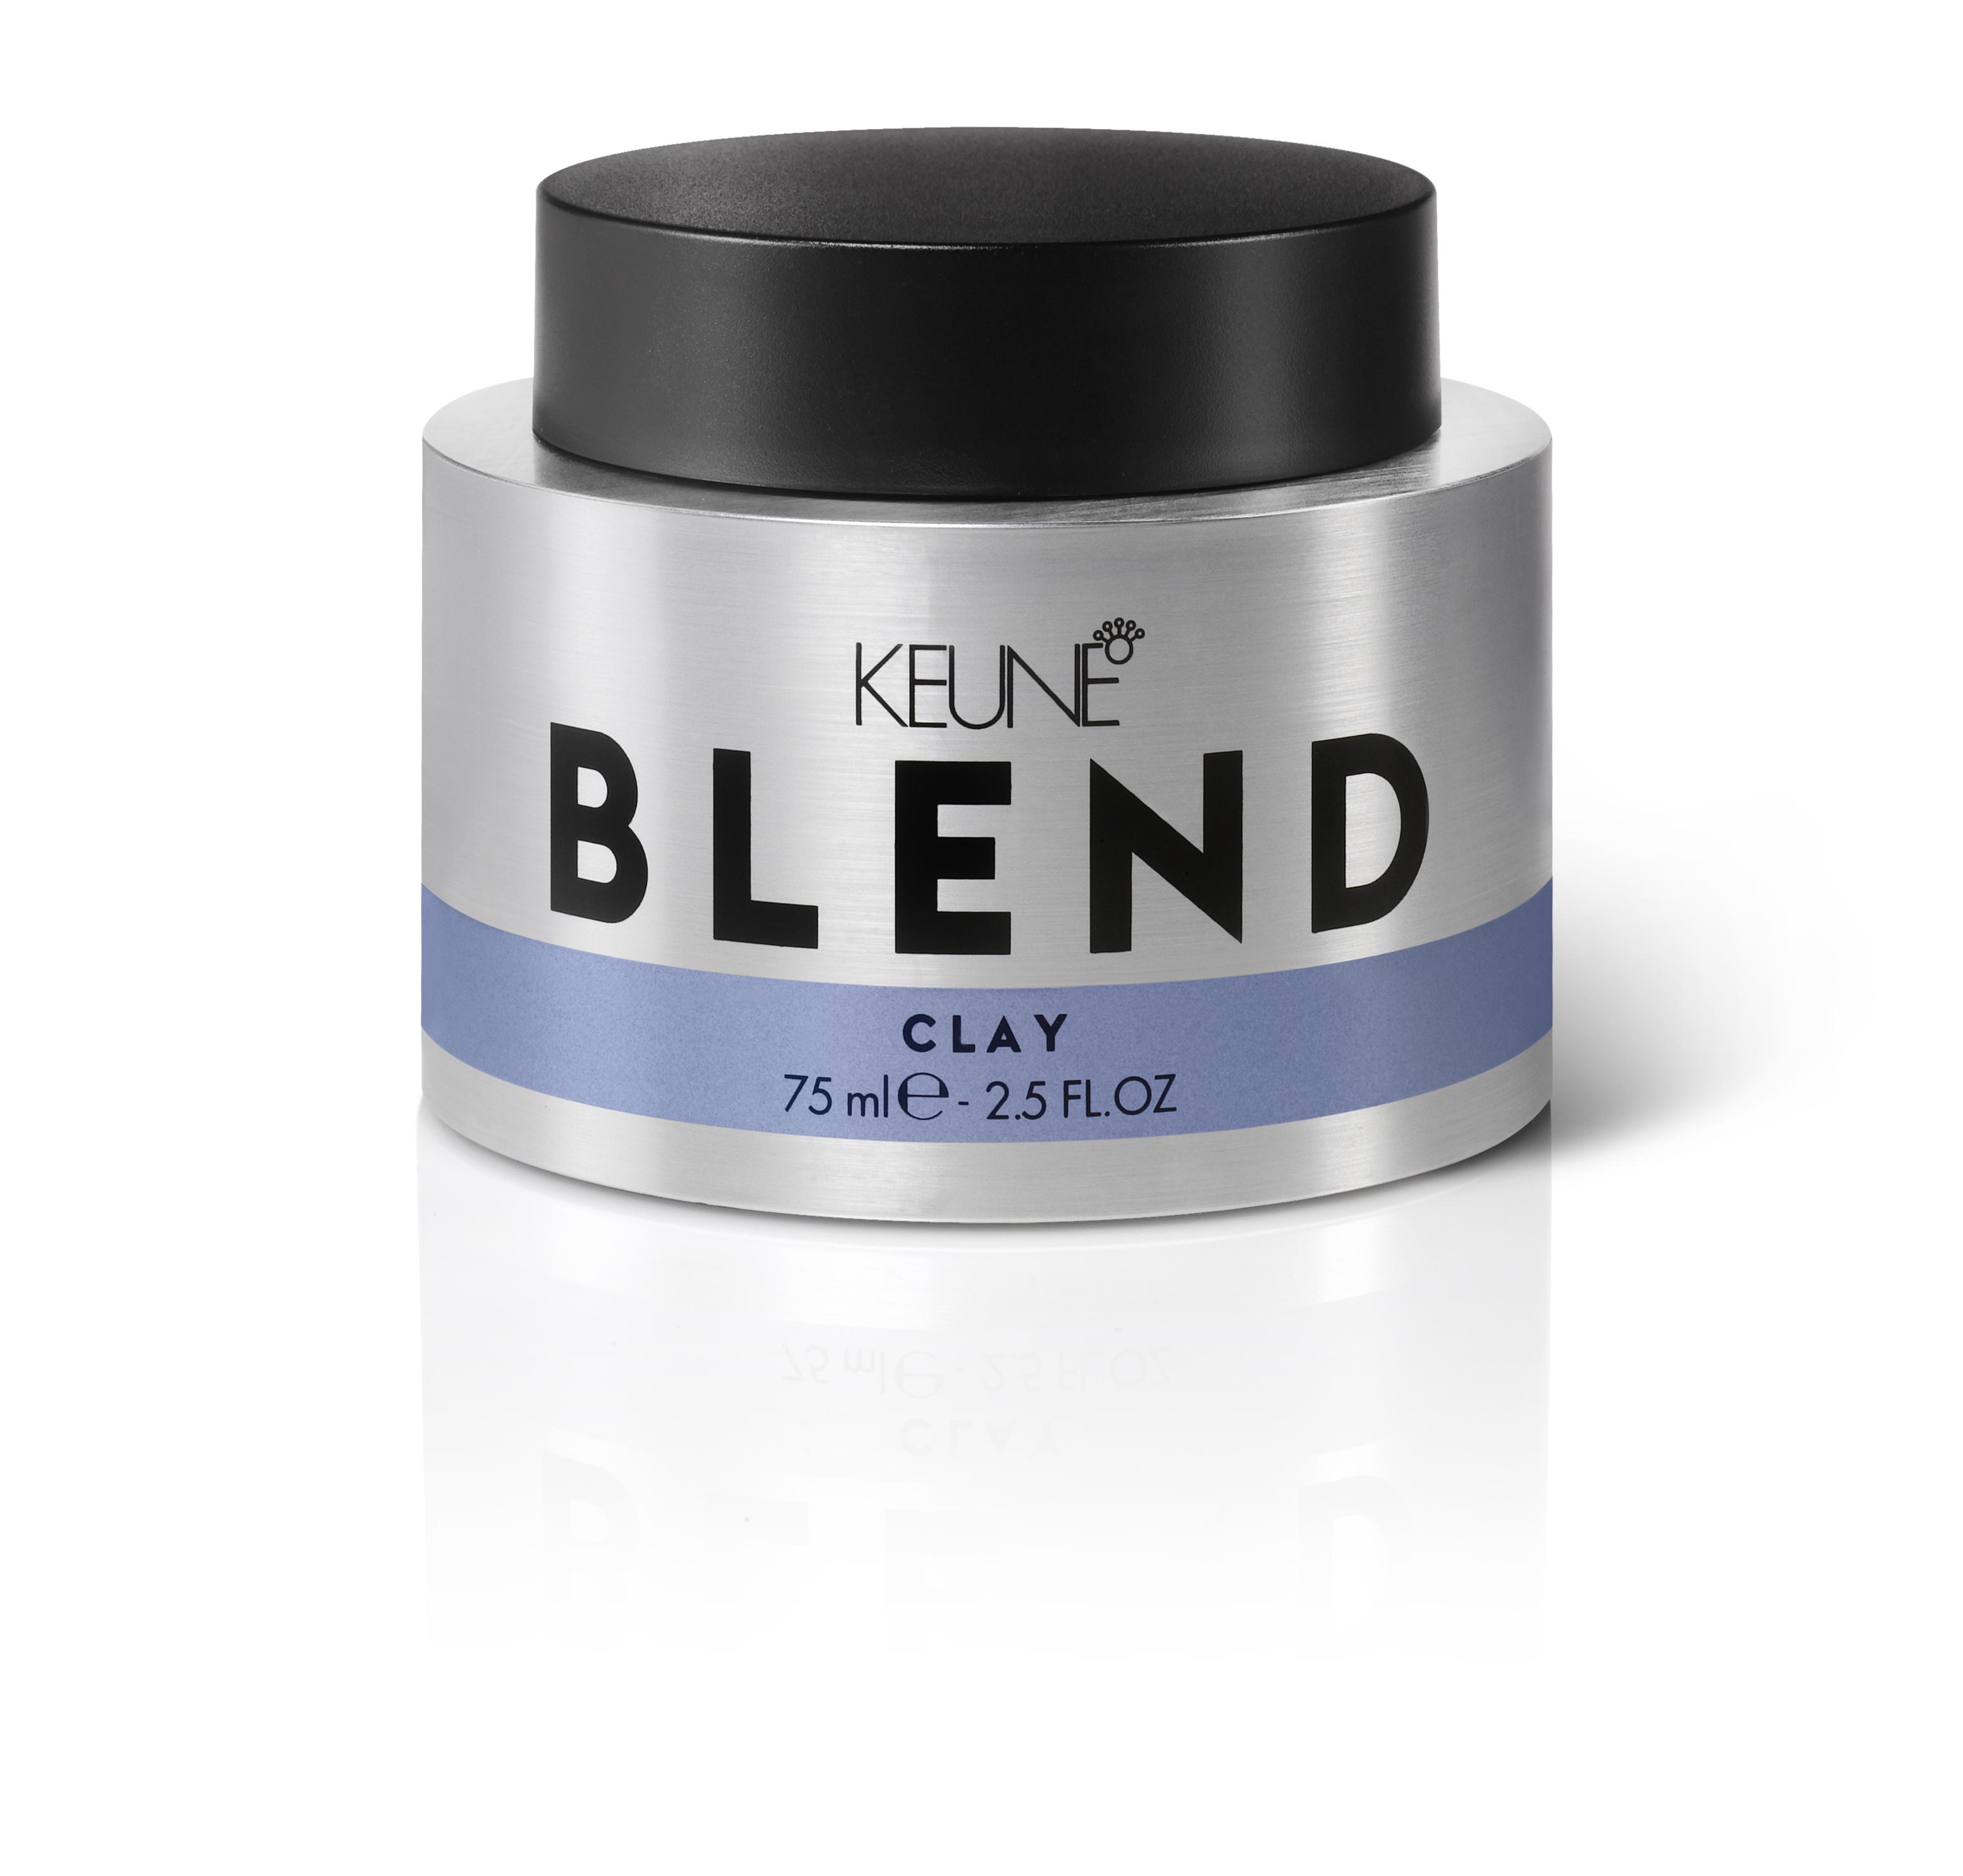 KEUNE Глина для волос / BLEND CLAY, 75 мл от Галерея Косметики